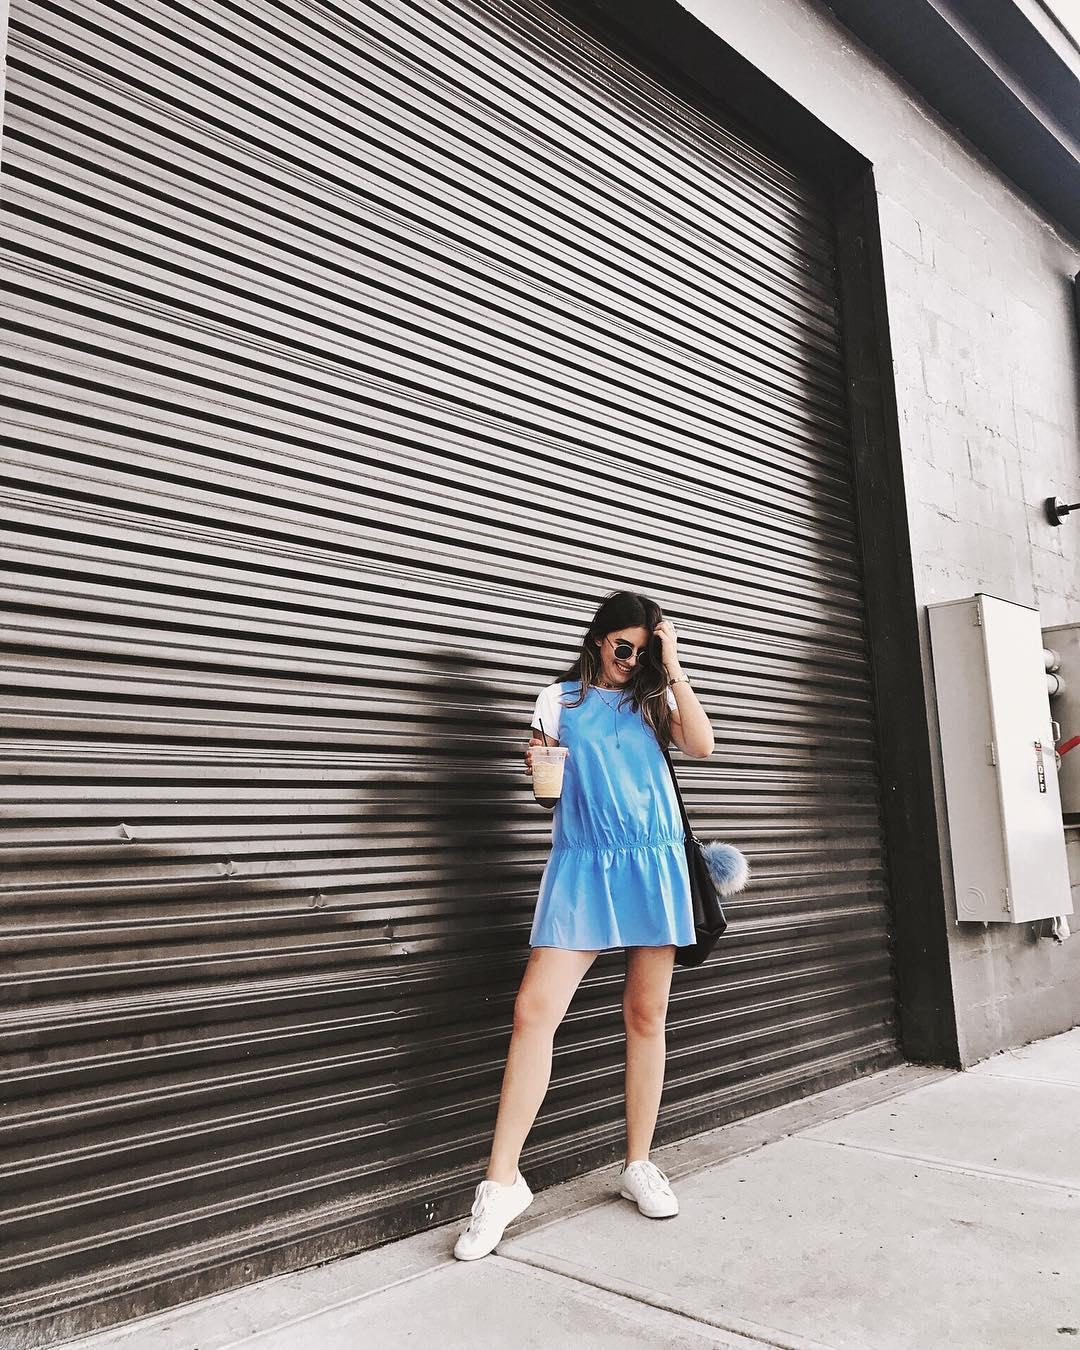 Summery blue dress